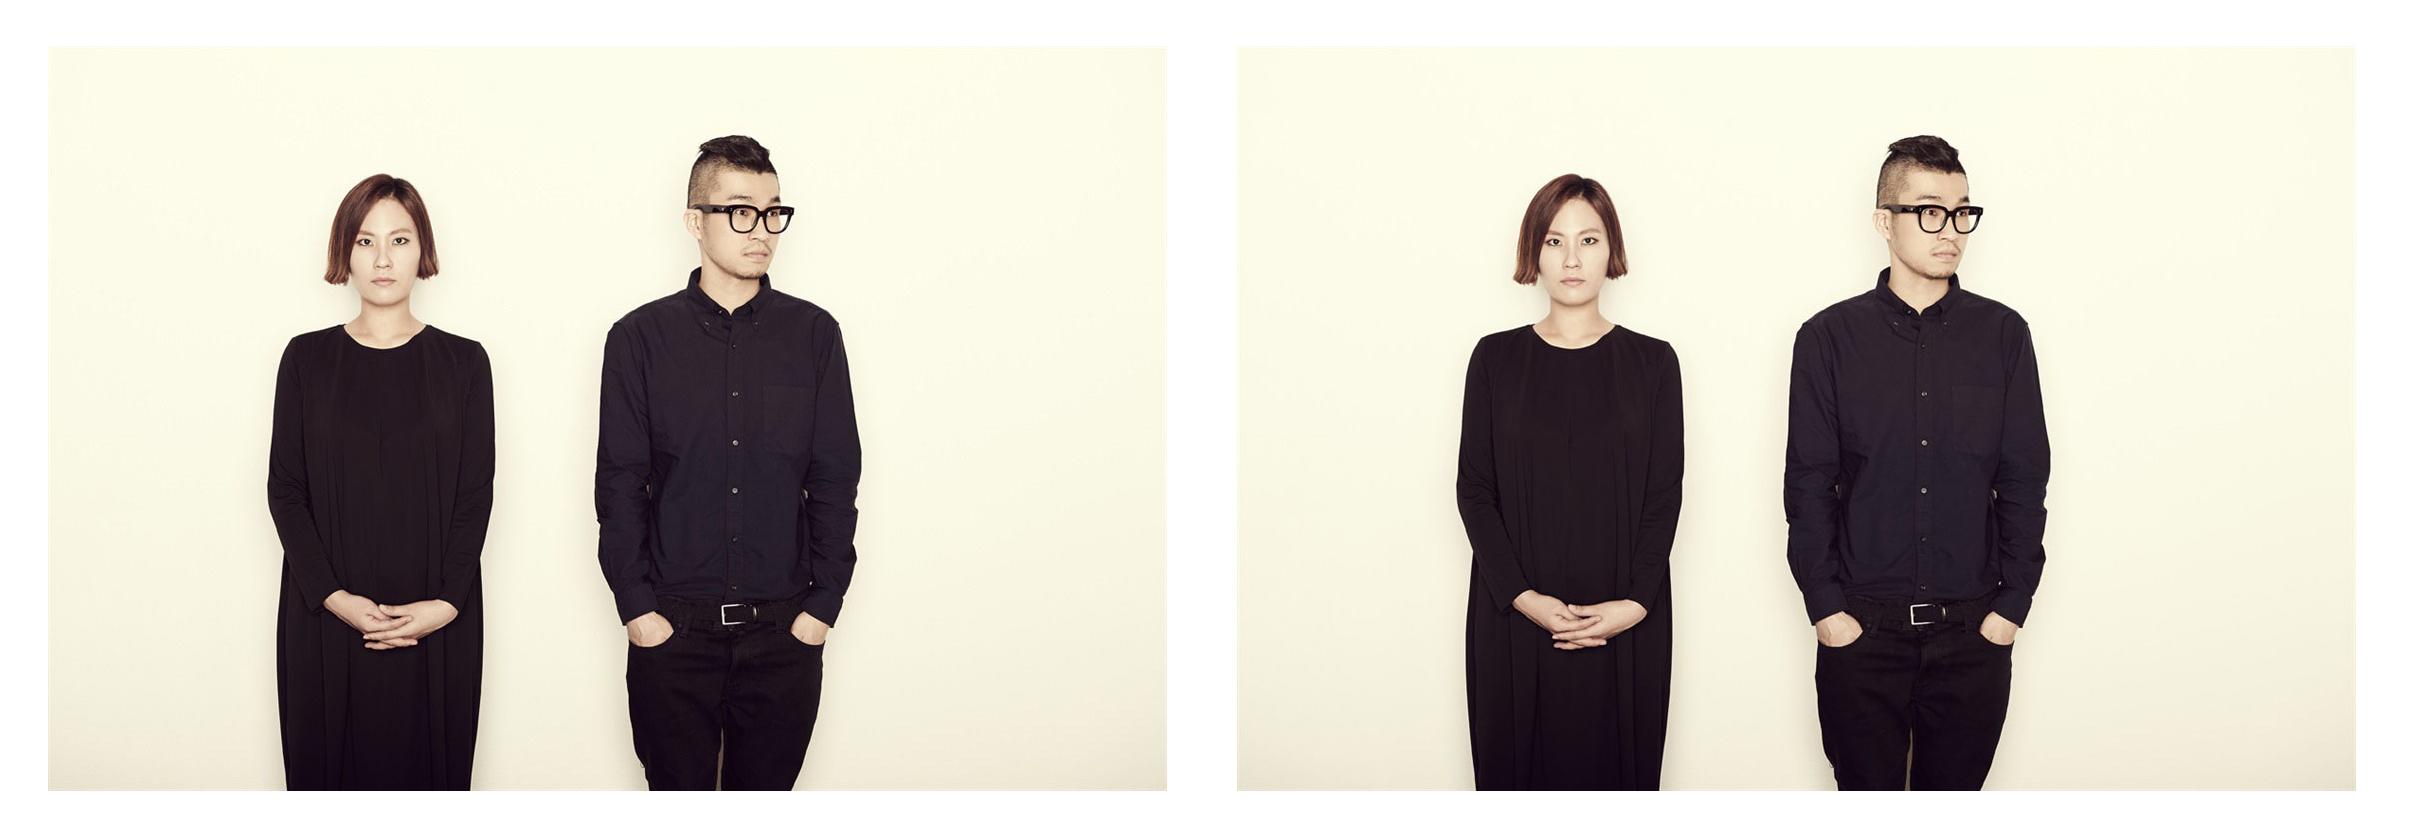 Founders of JKOO, Jin Woo Choi and Yeon Joo Koo